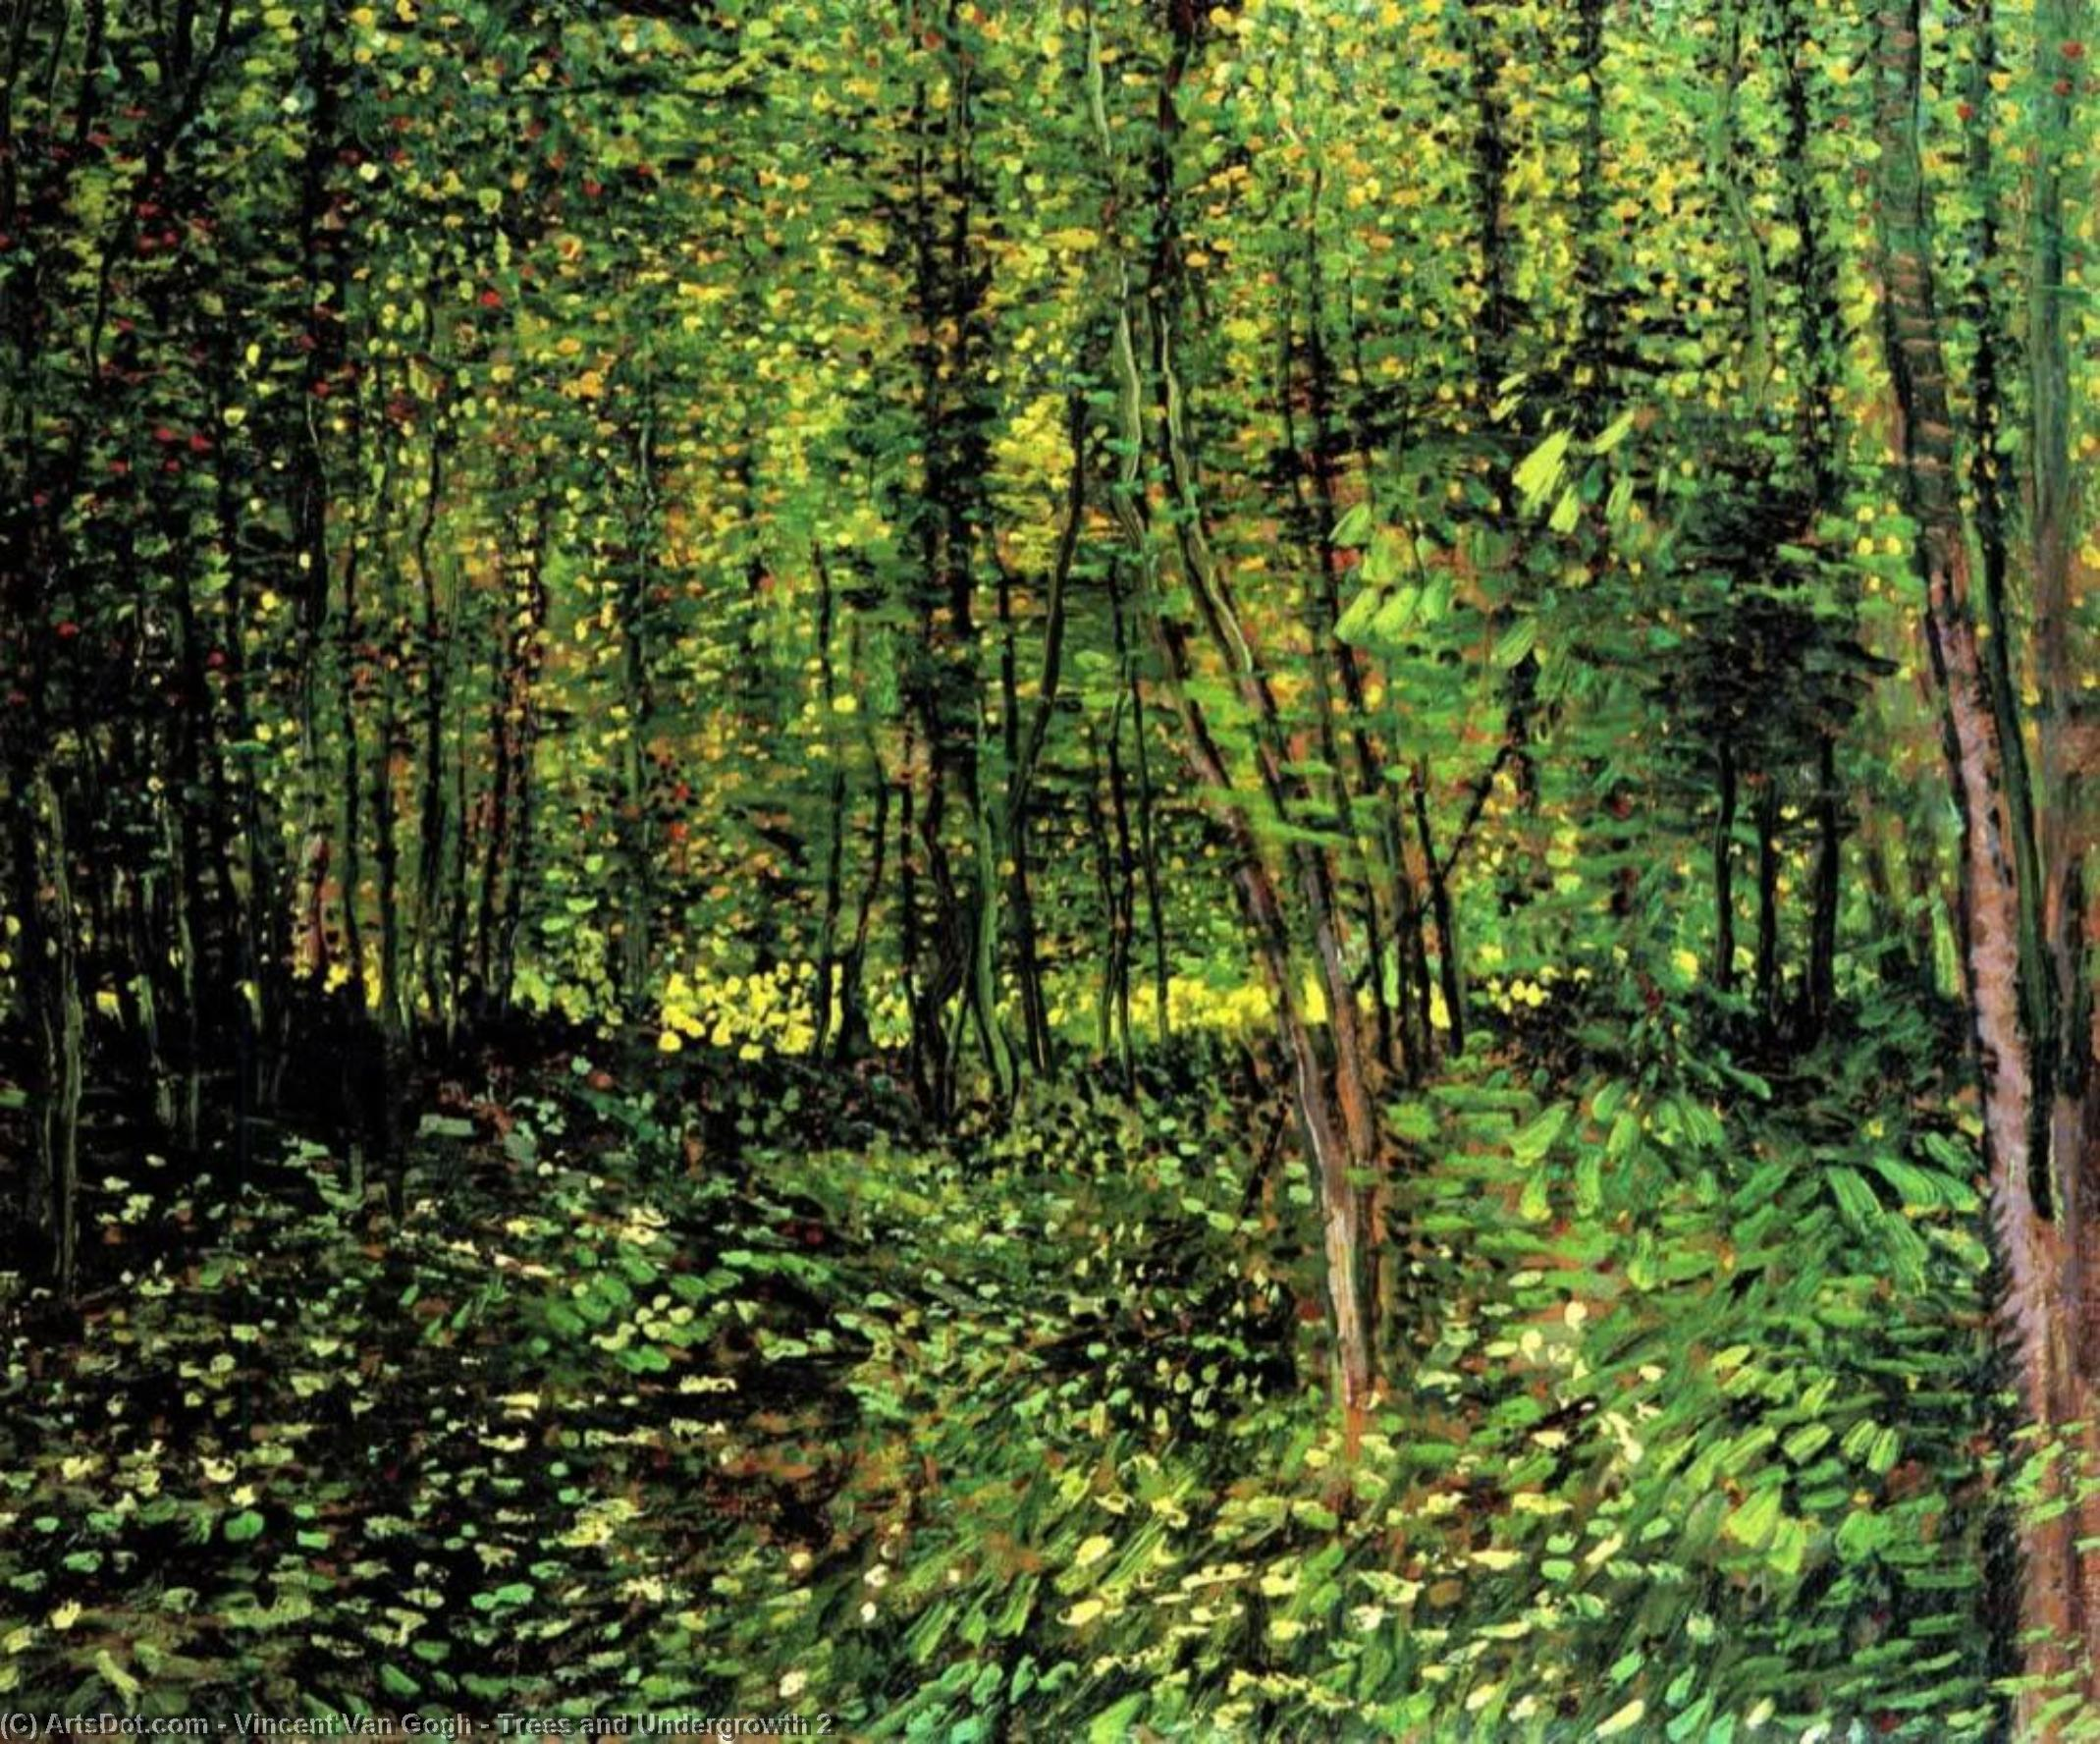 WikiOO.org - دایره المعارف هنرهای زیبا - نقاشی، آثار هنری Vincent Van Gogh - Trees and Undergrowth 2